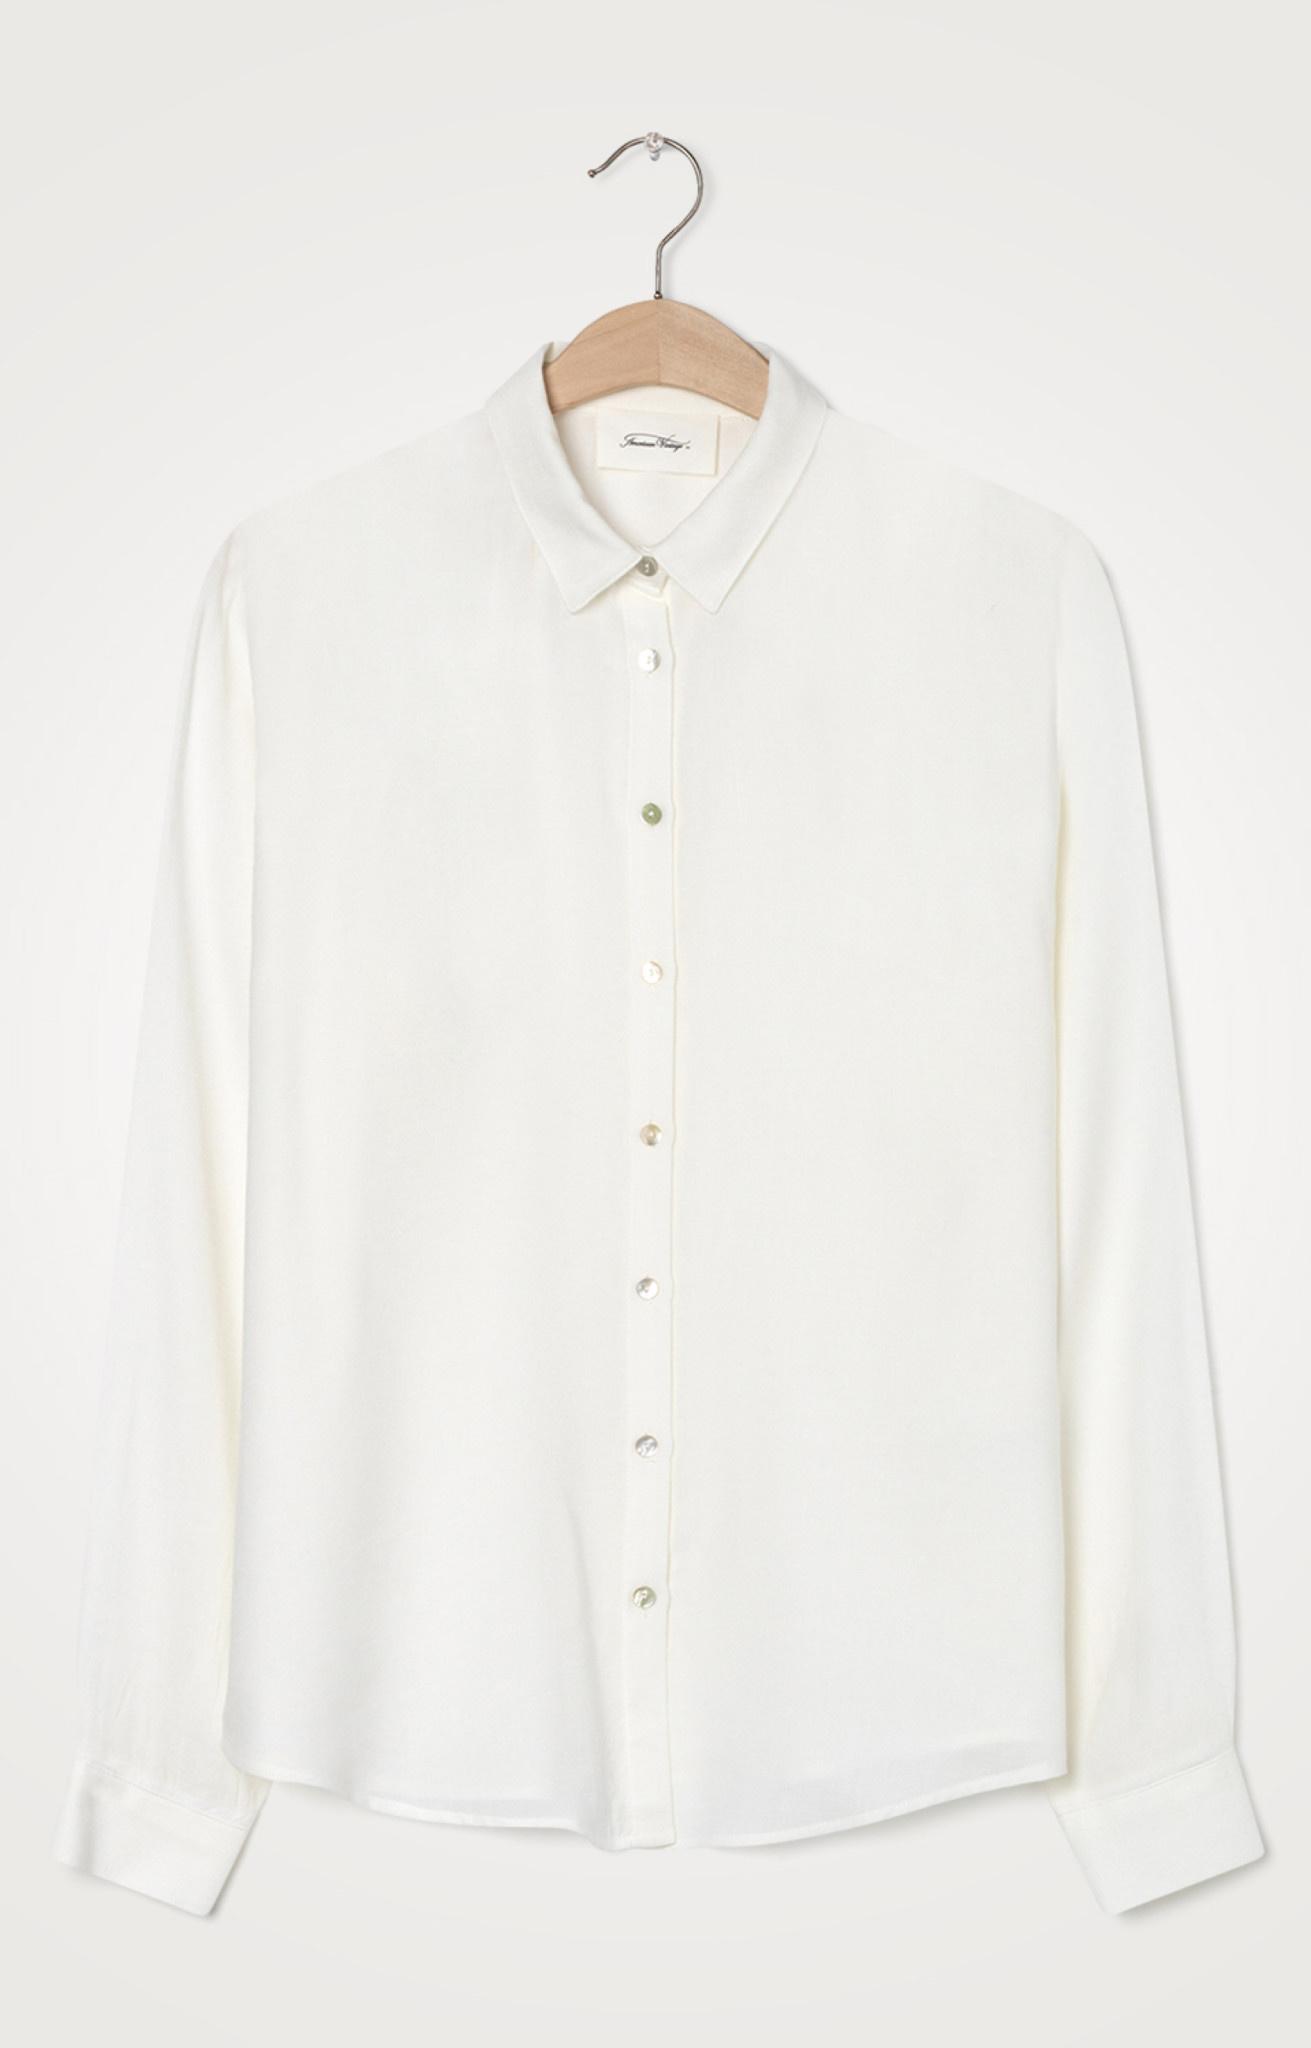 Dorabird Ecru White Shirt-2